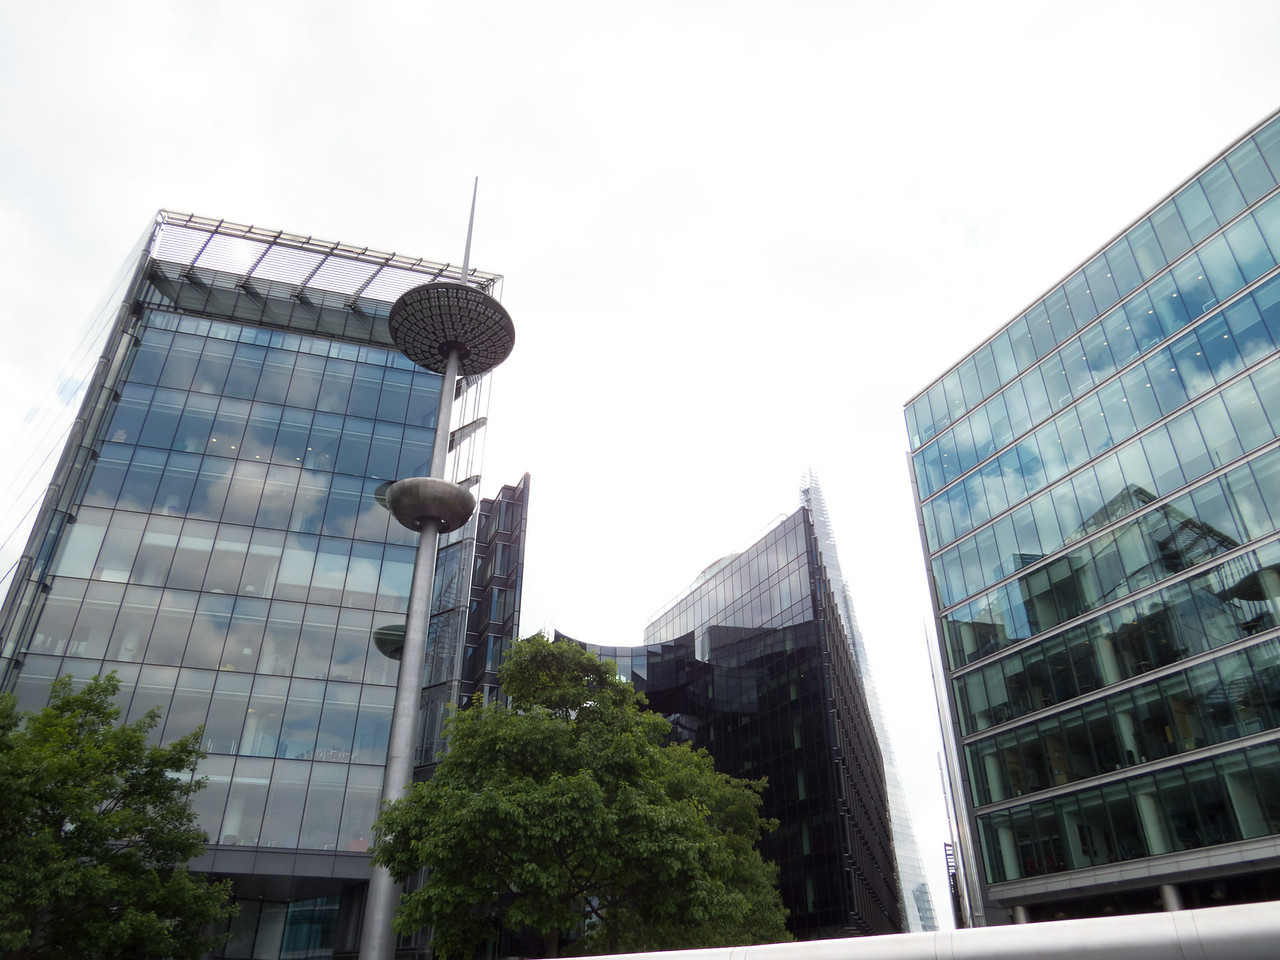 Buildings along South Bank